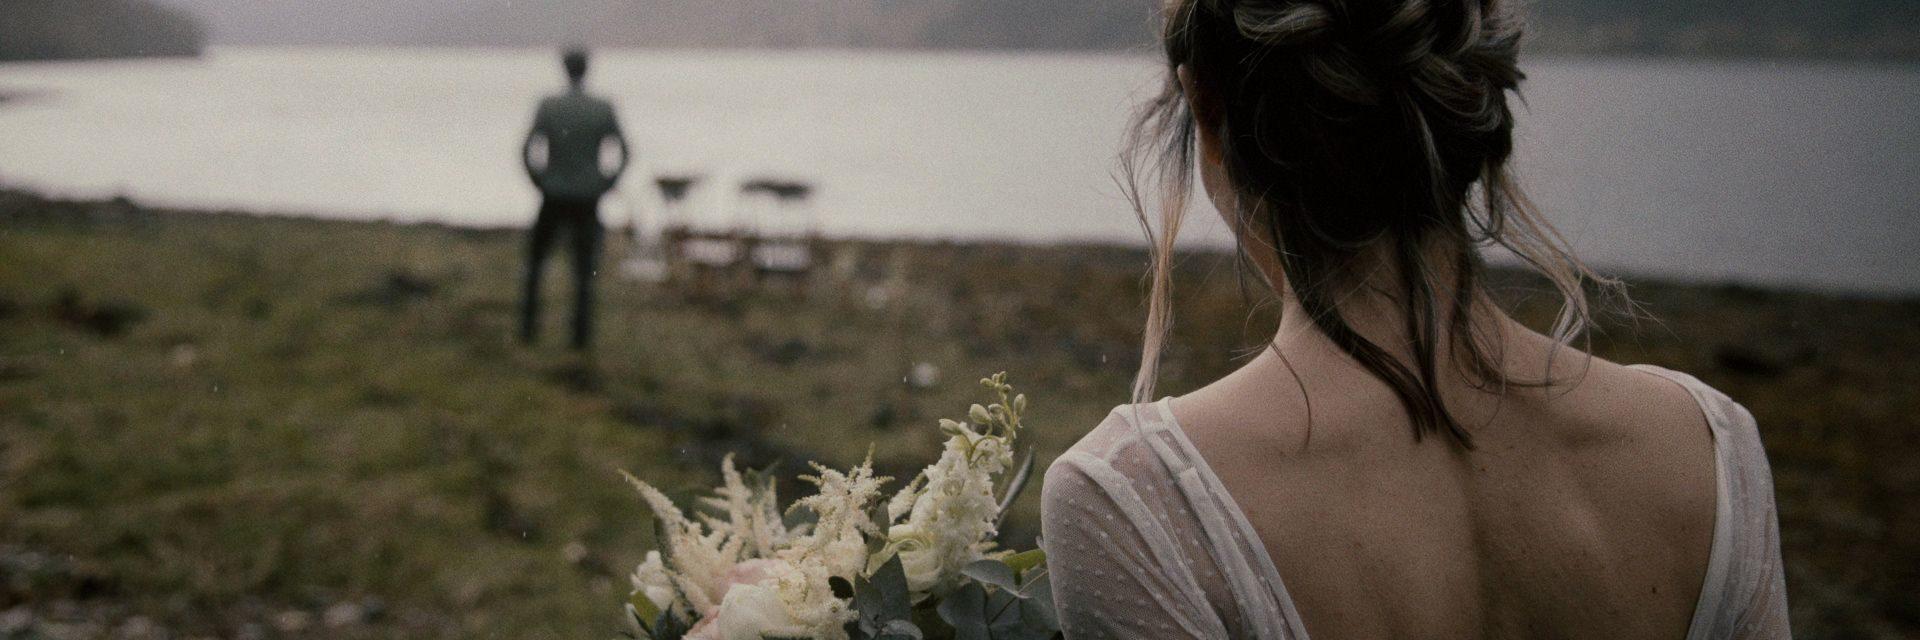 Sicily-wedding-videographer-cinemate-films-02